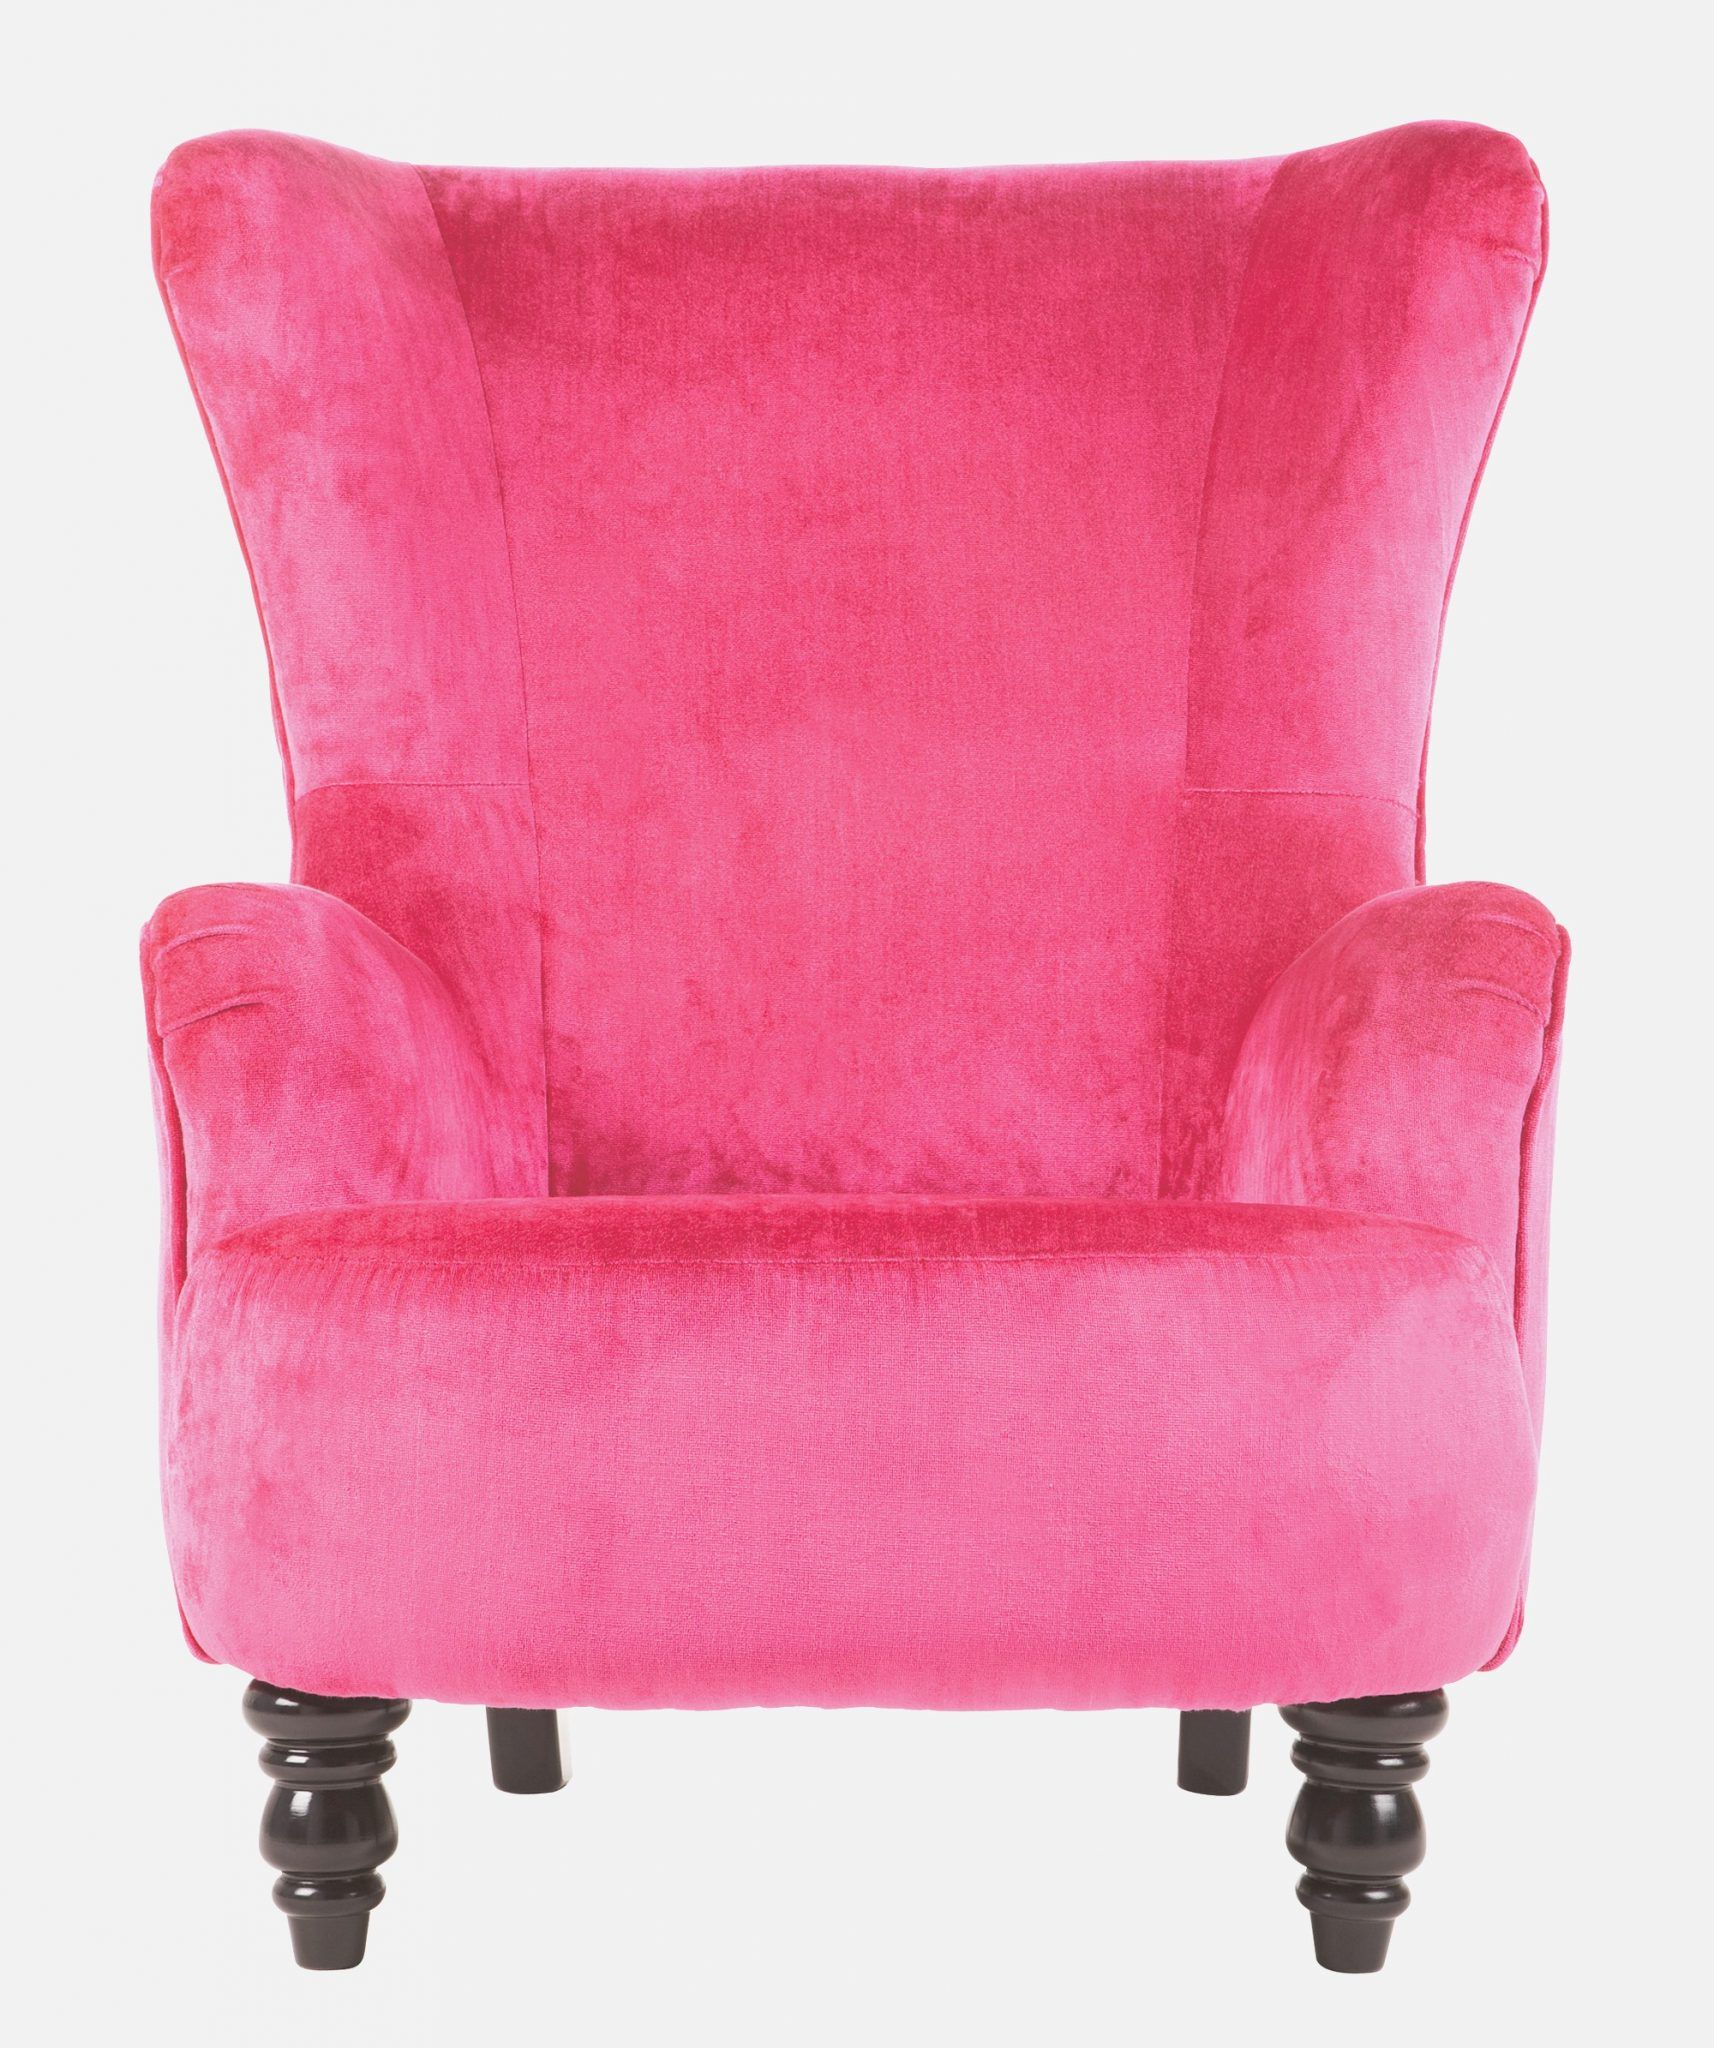 Yoga Sofa Kramfors Leather Corner Chair Stretch Chaise Lounge